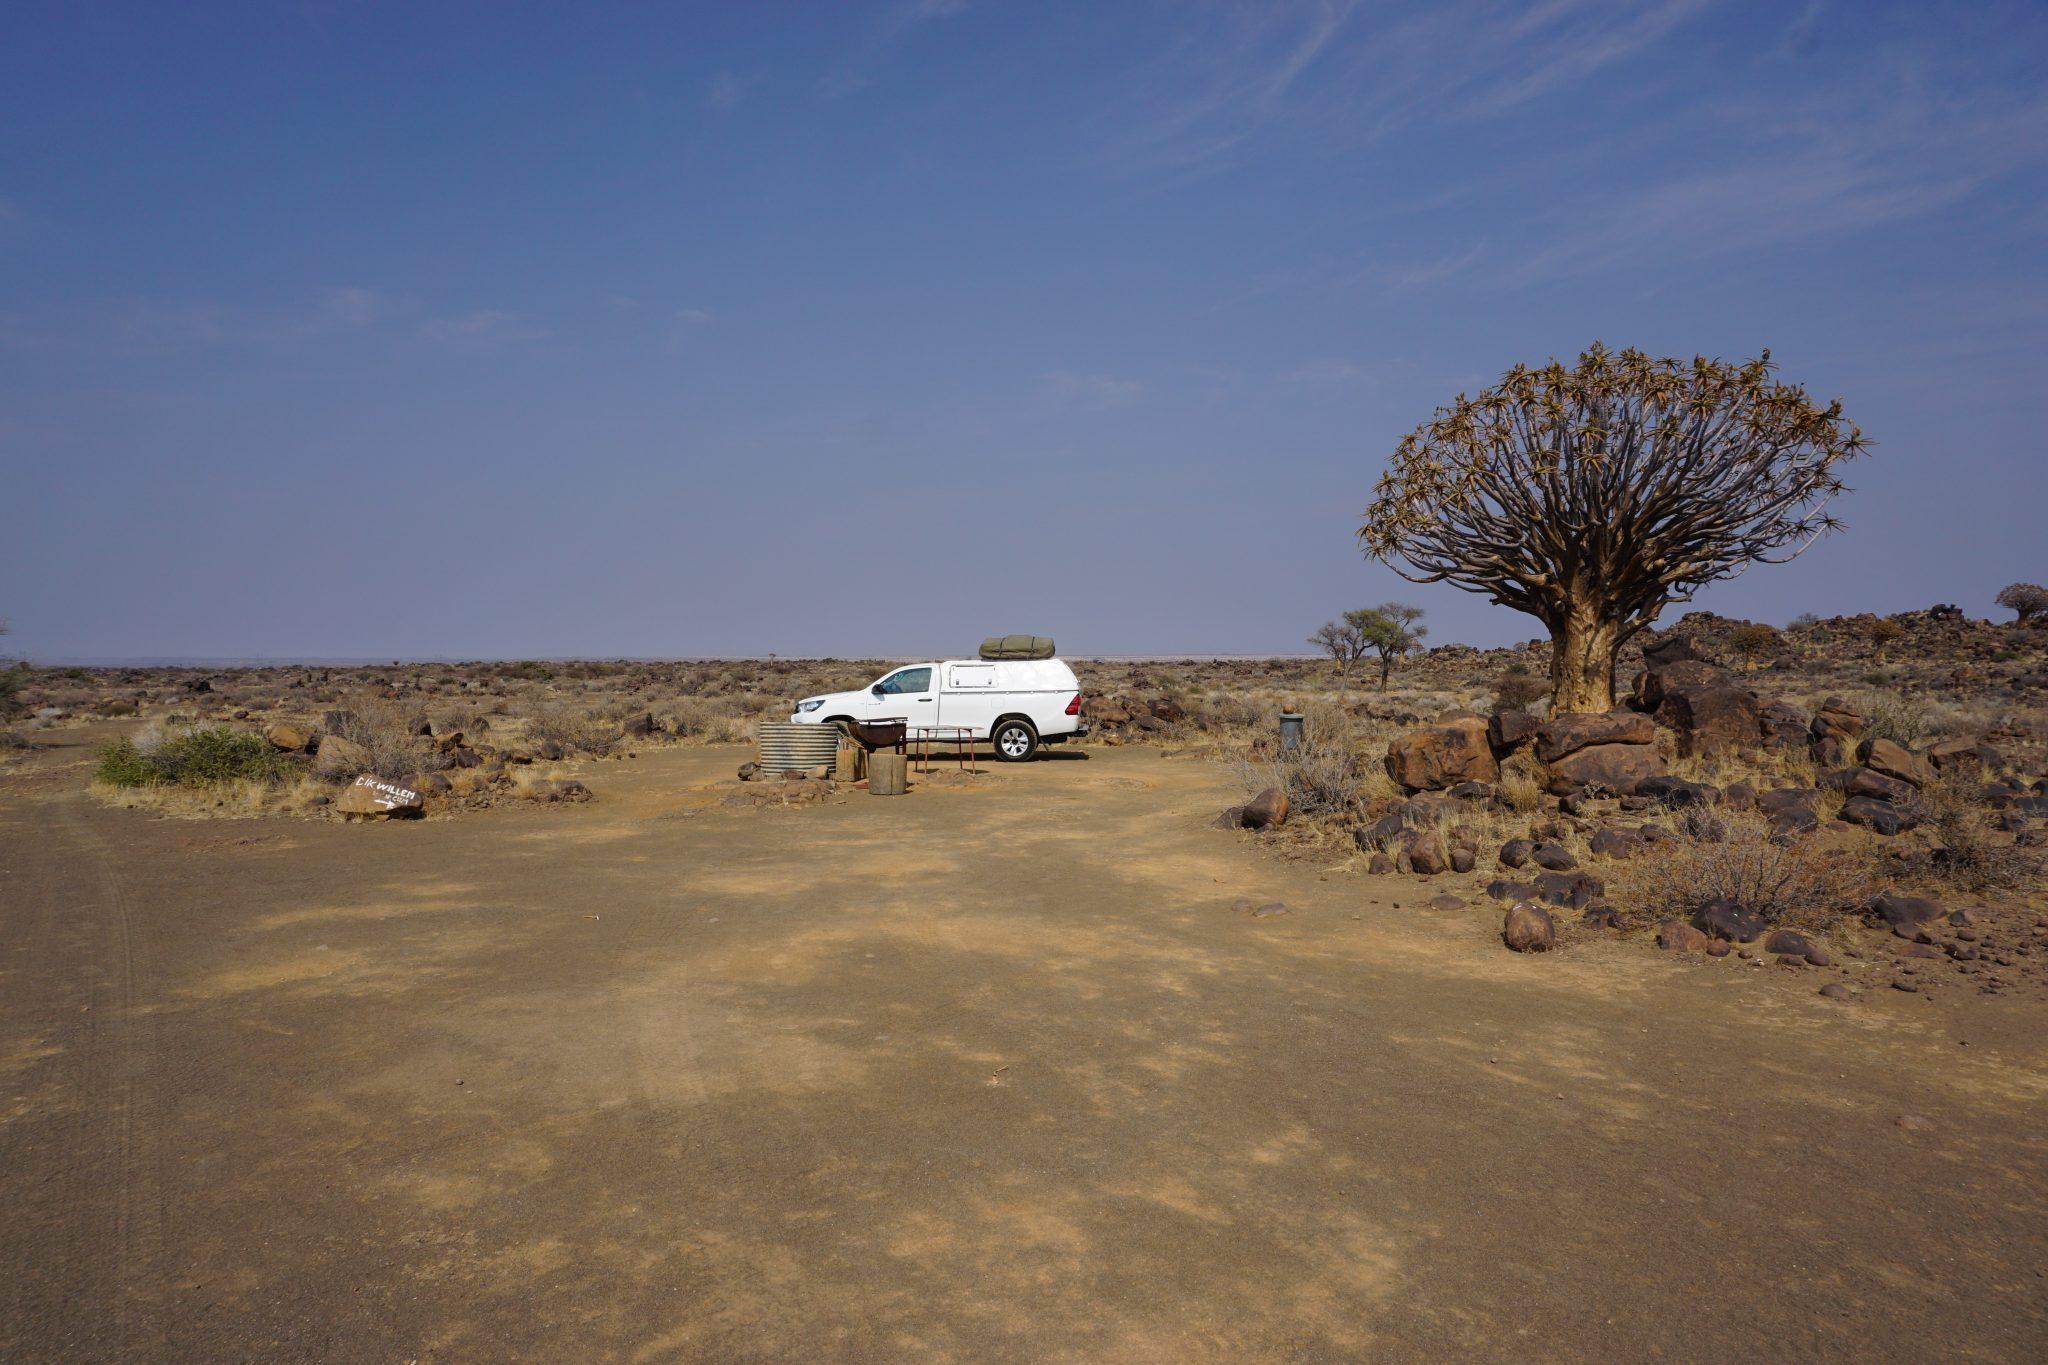 Namibia Reise: Unser Camper